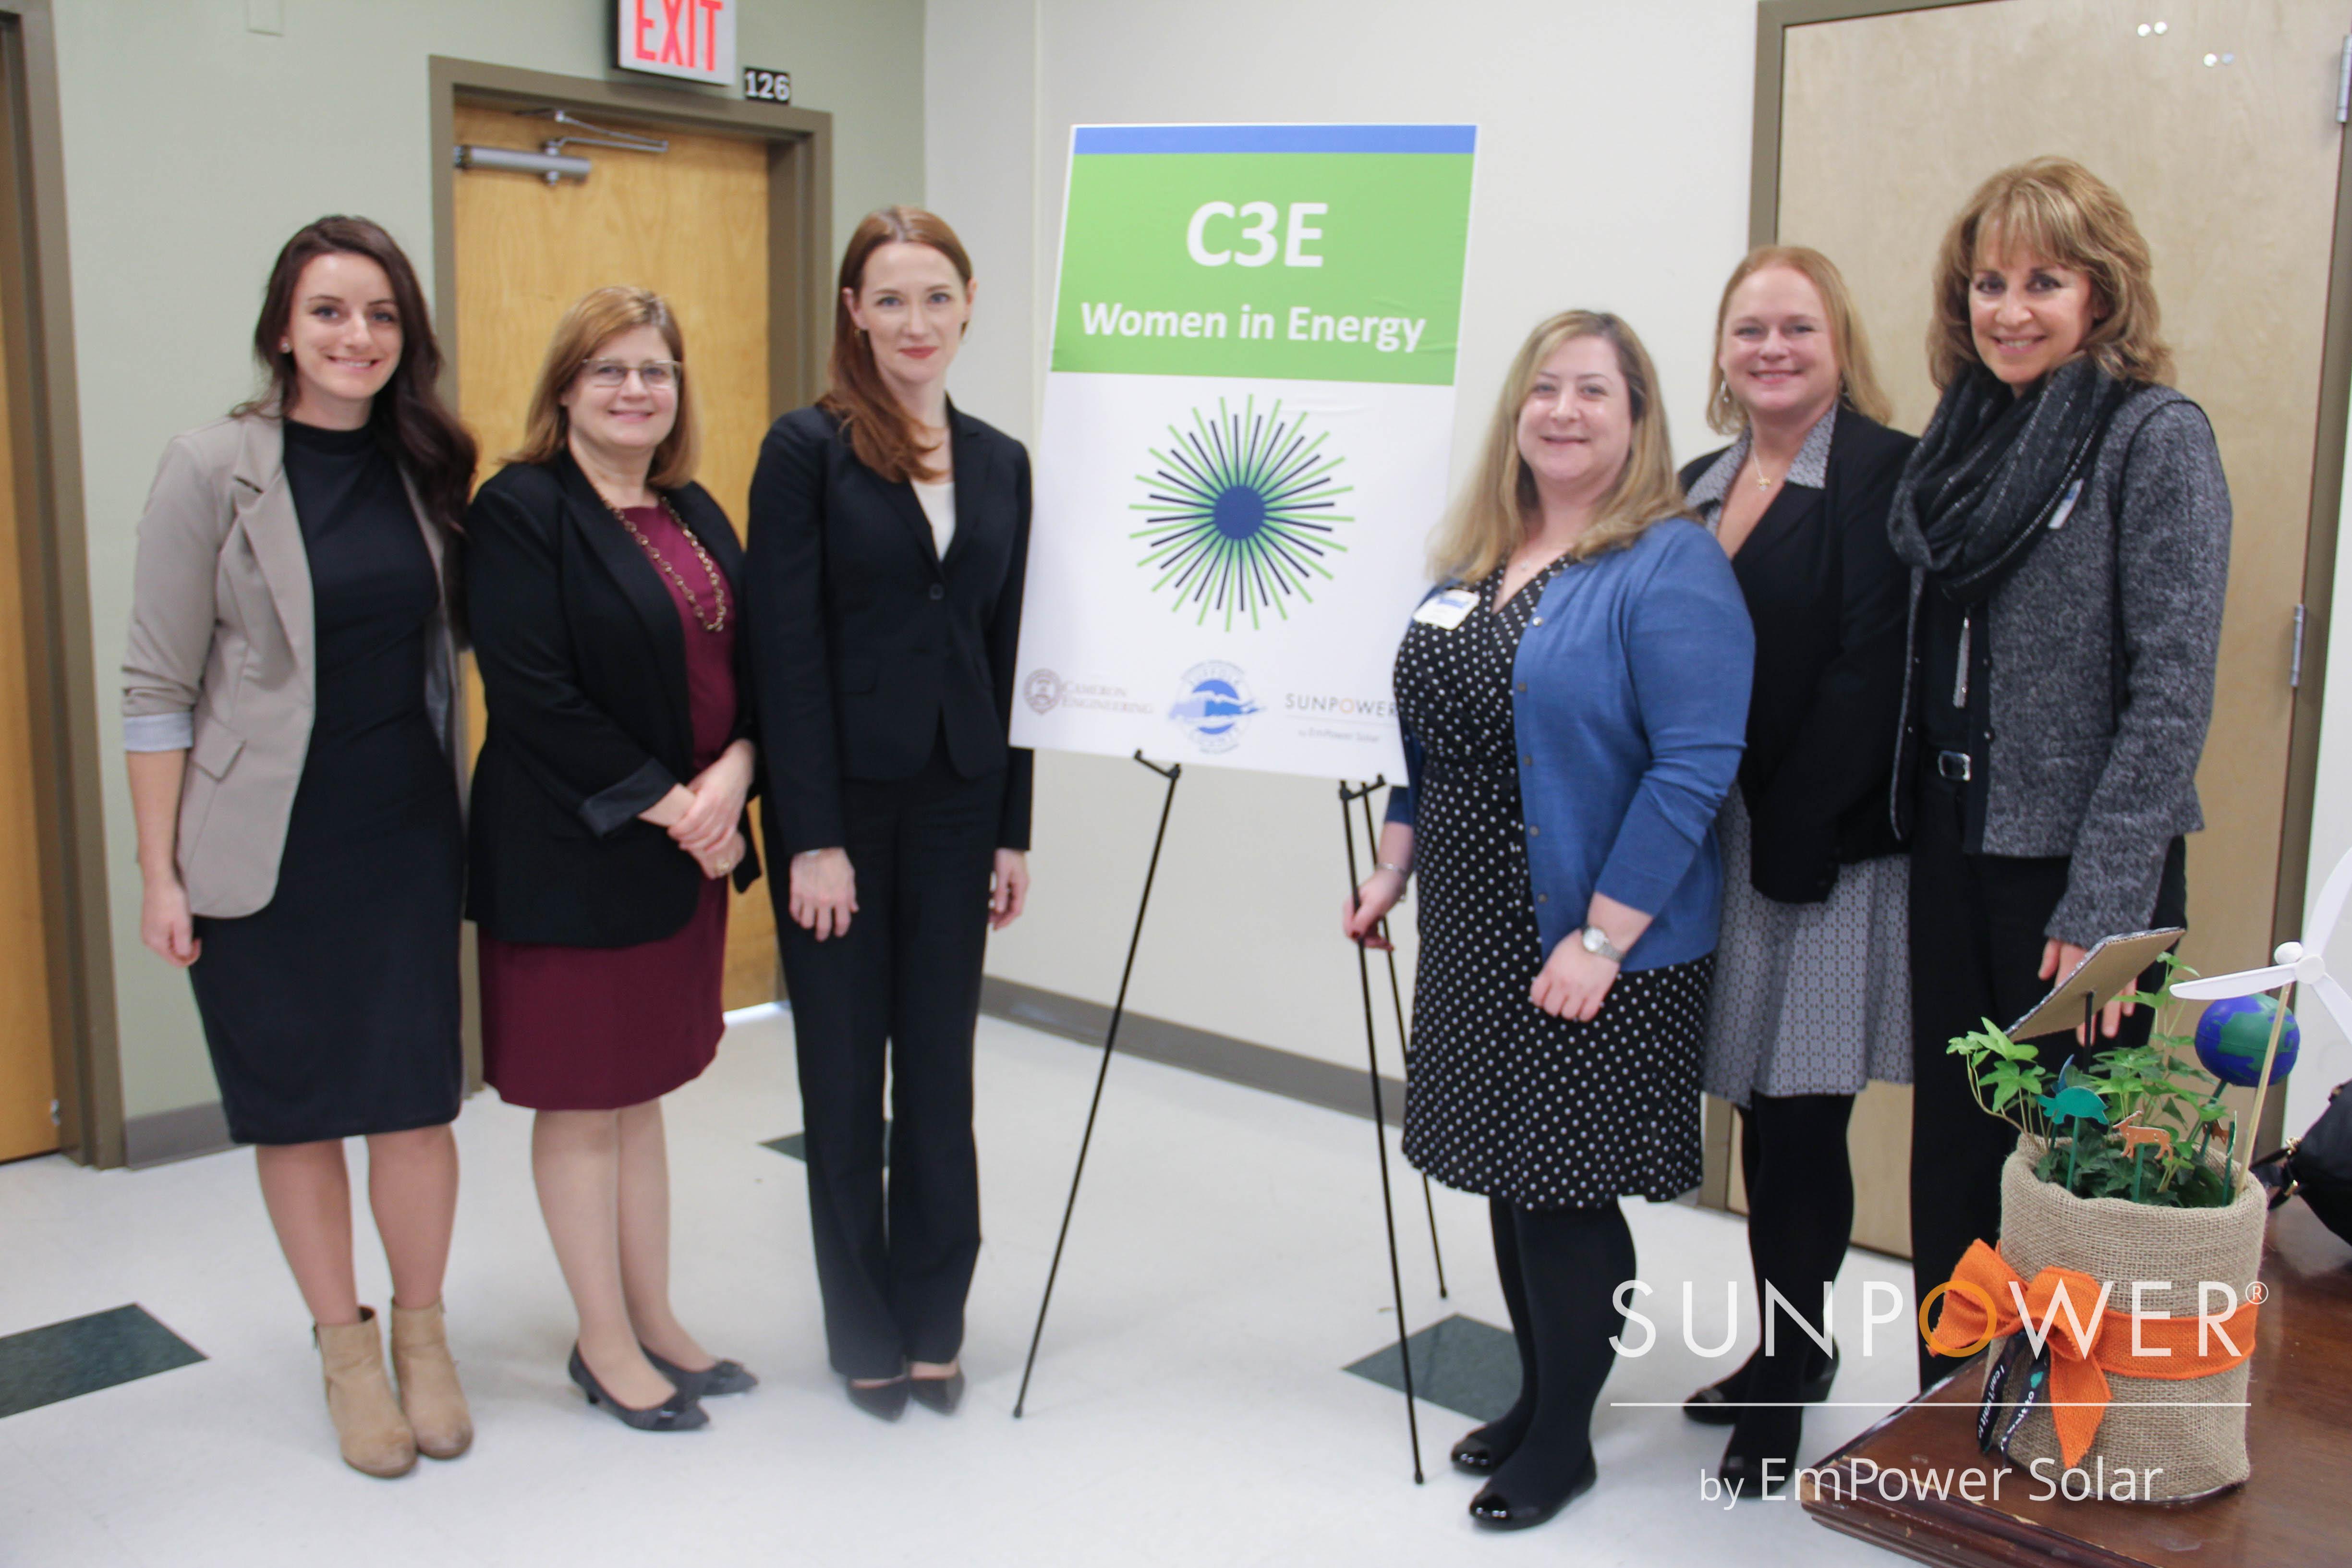 C3E Women in Energy Long Island Meetup SunPower by EmPower Solar